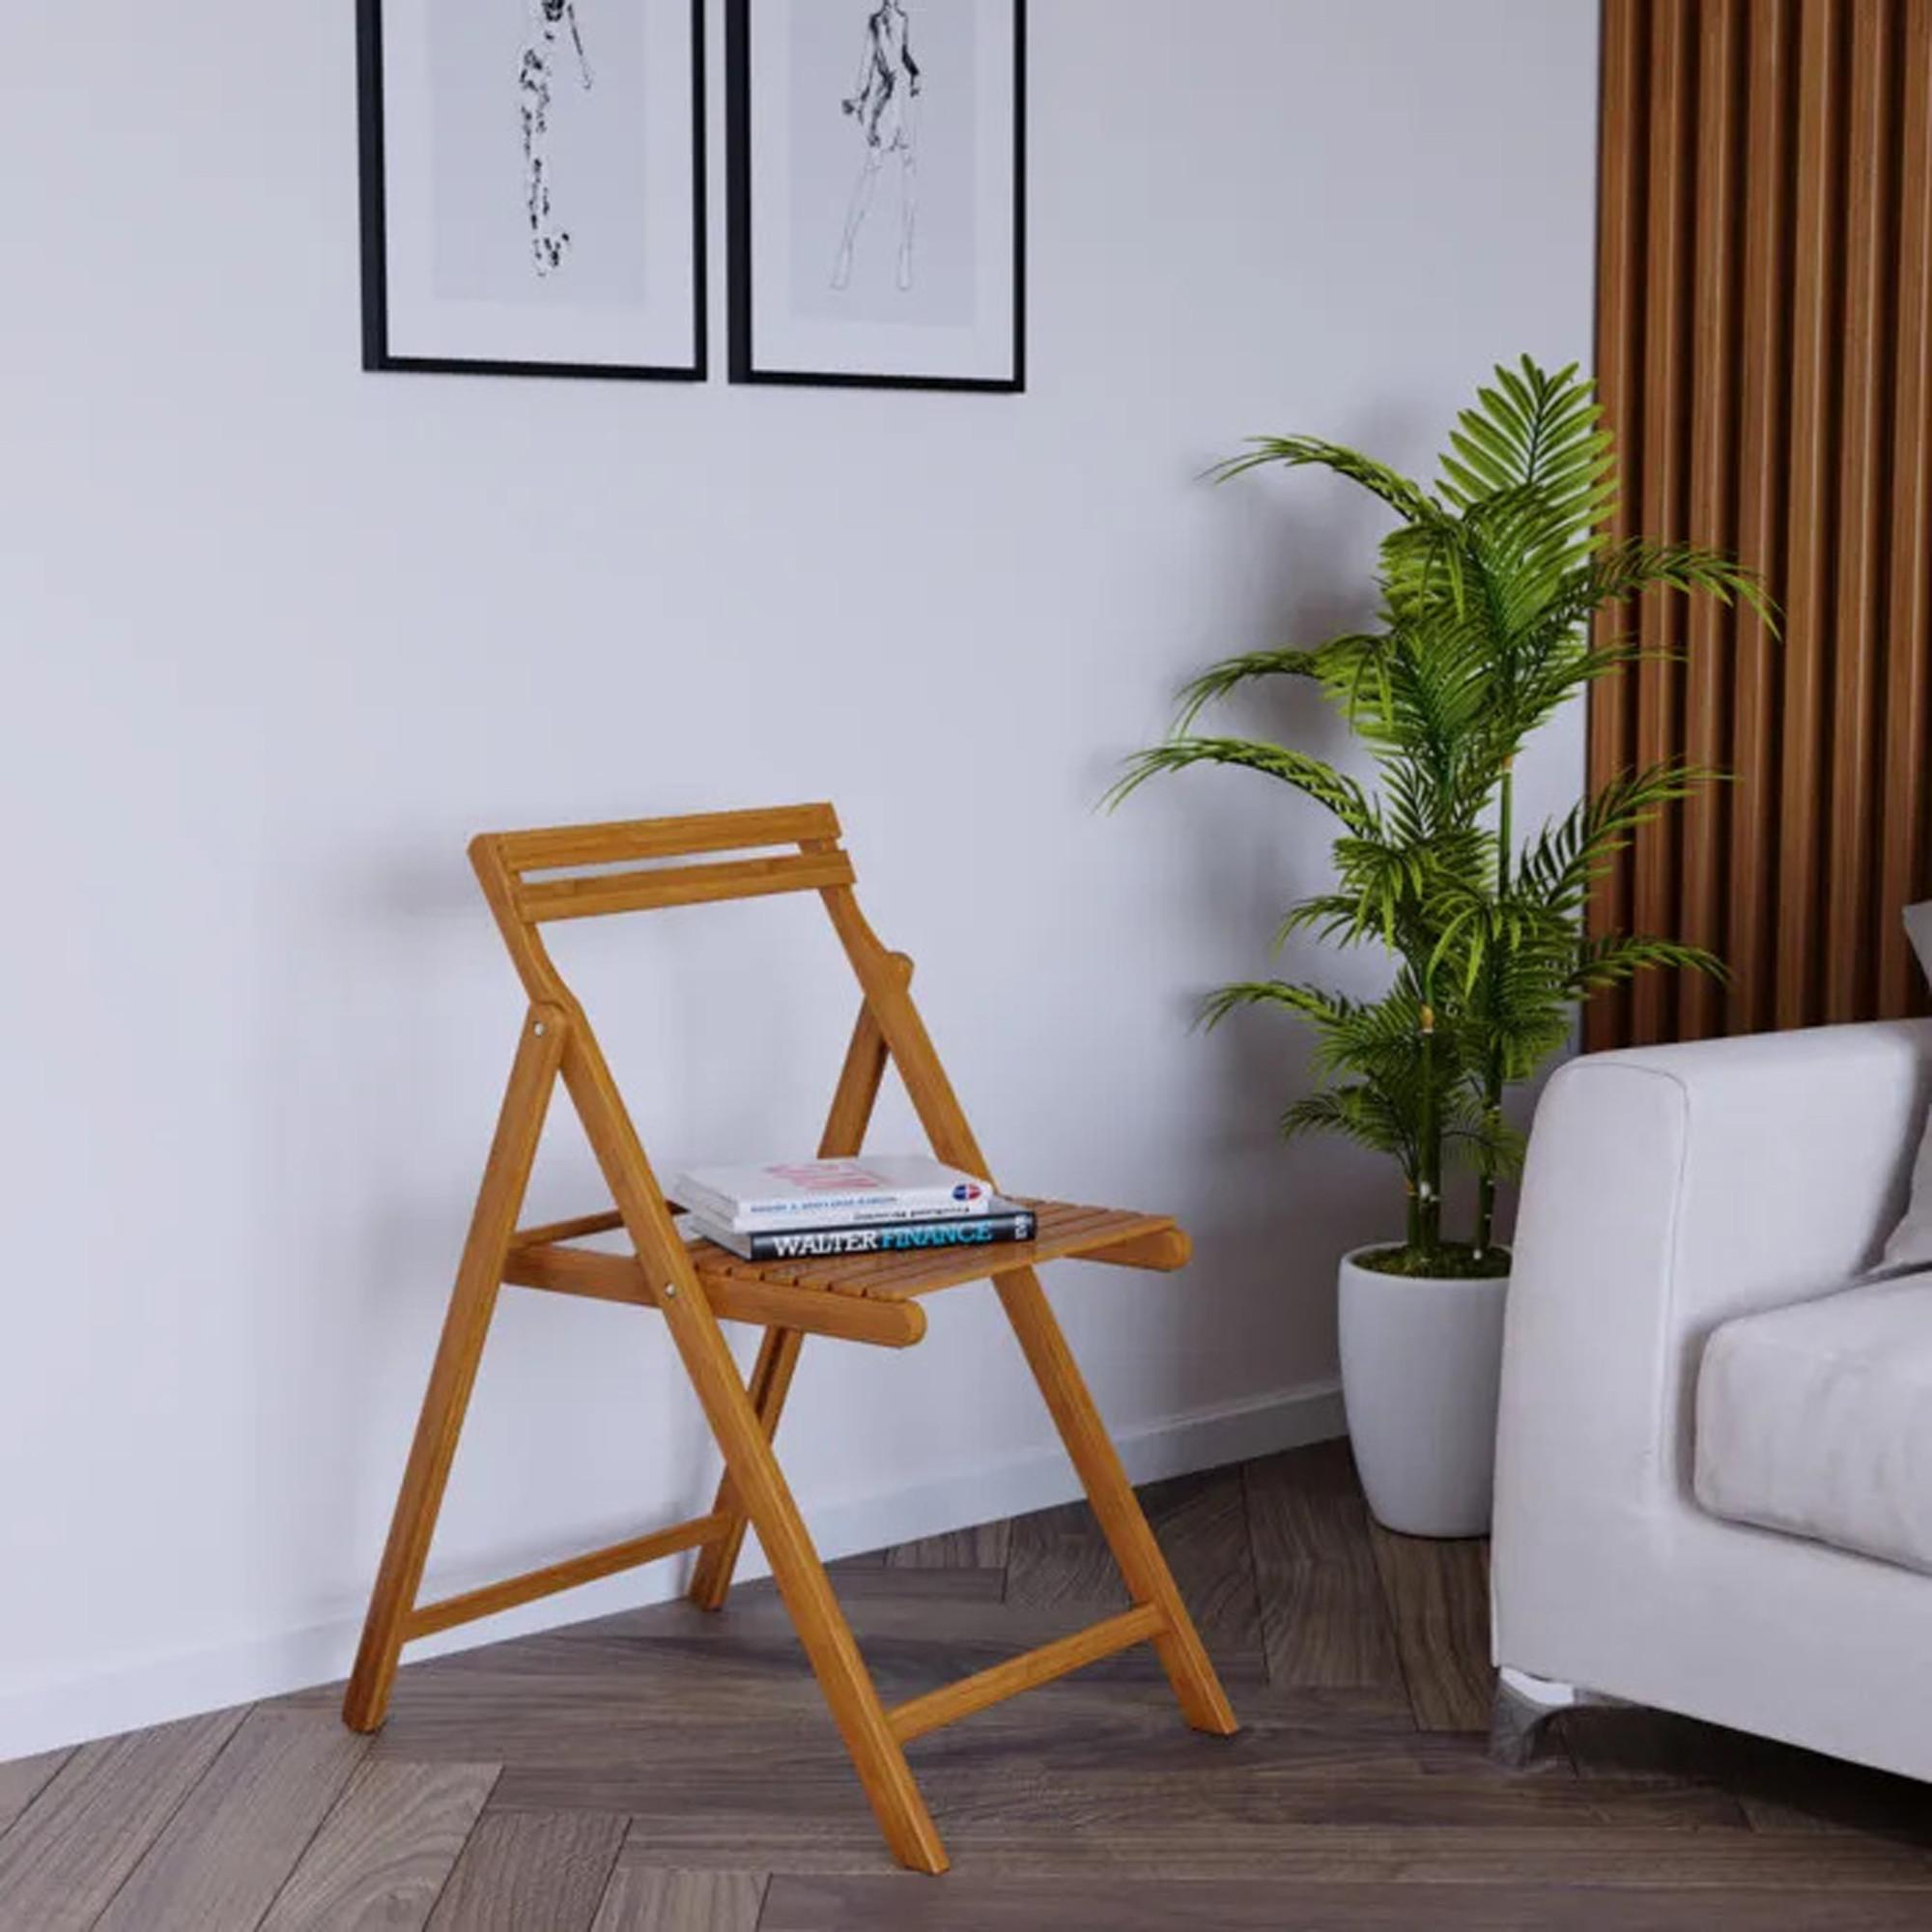 Складной стул из дуба, 50х73,9х57,8 см